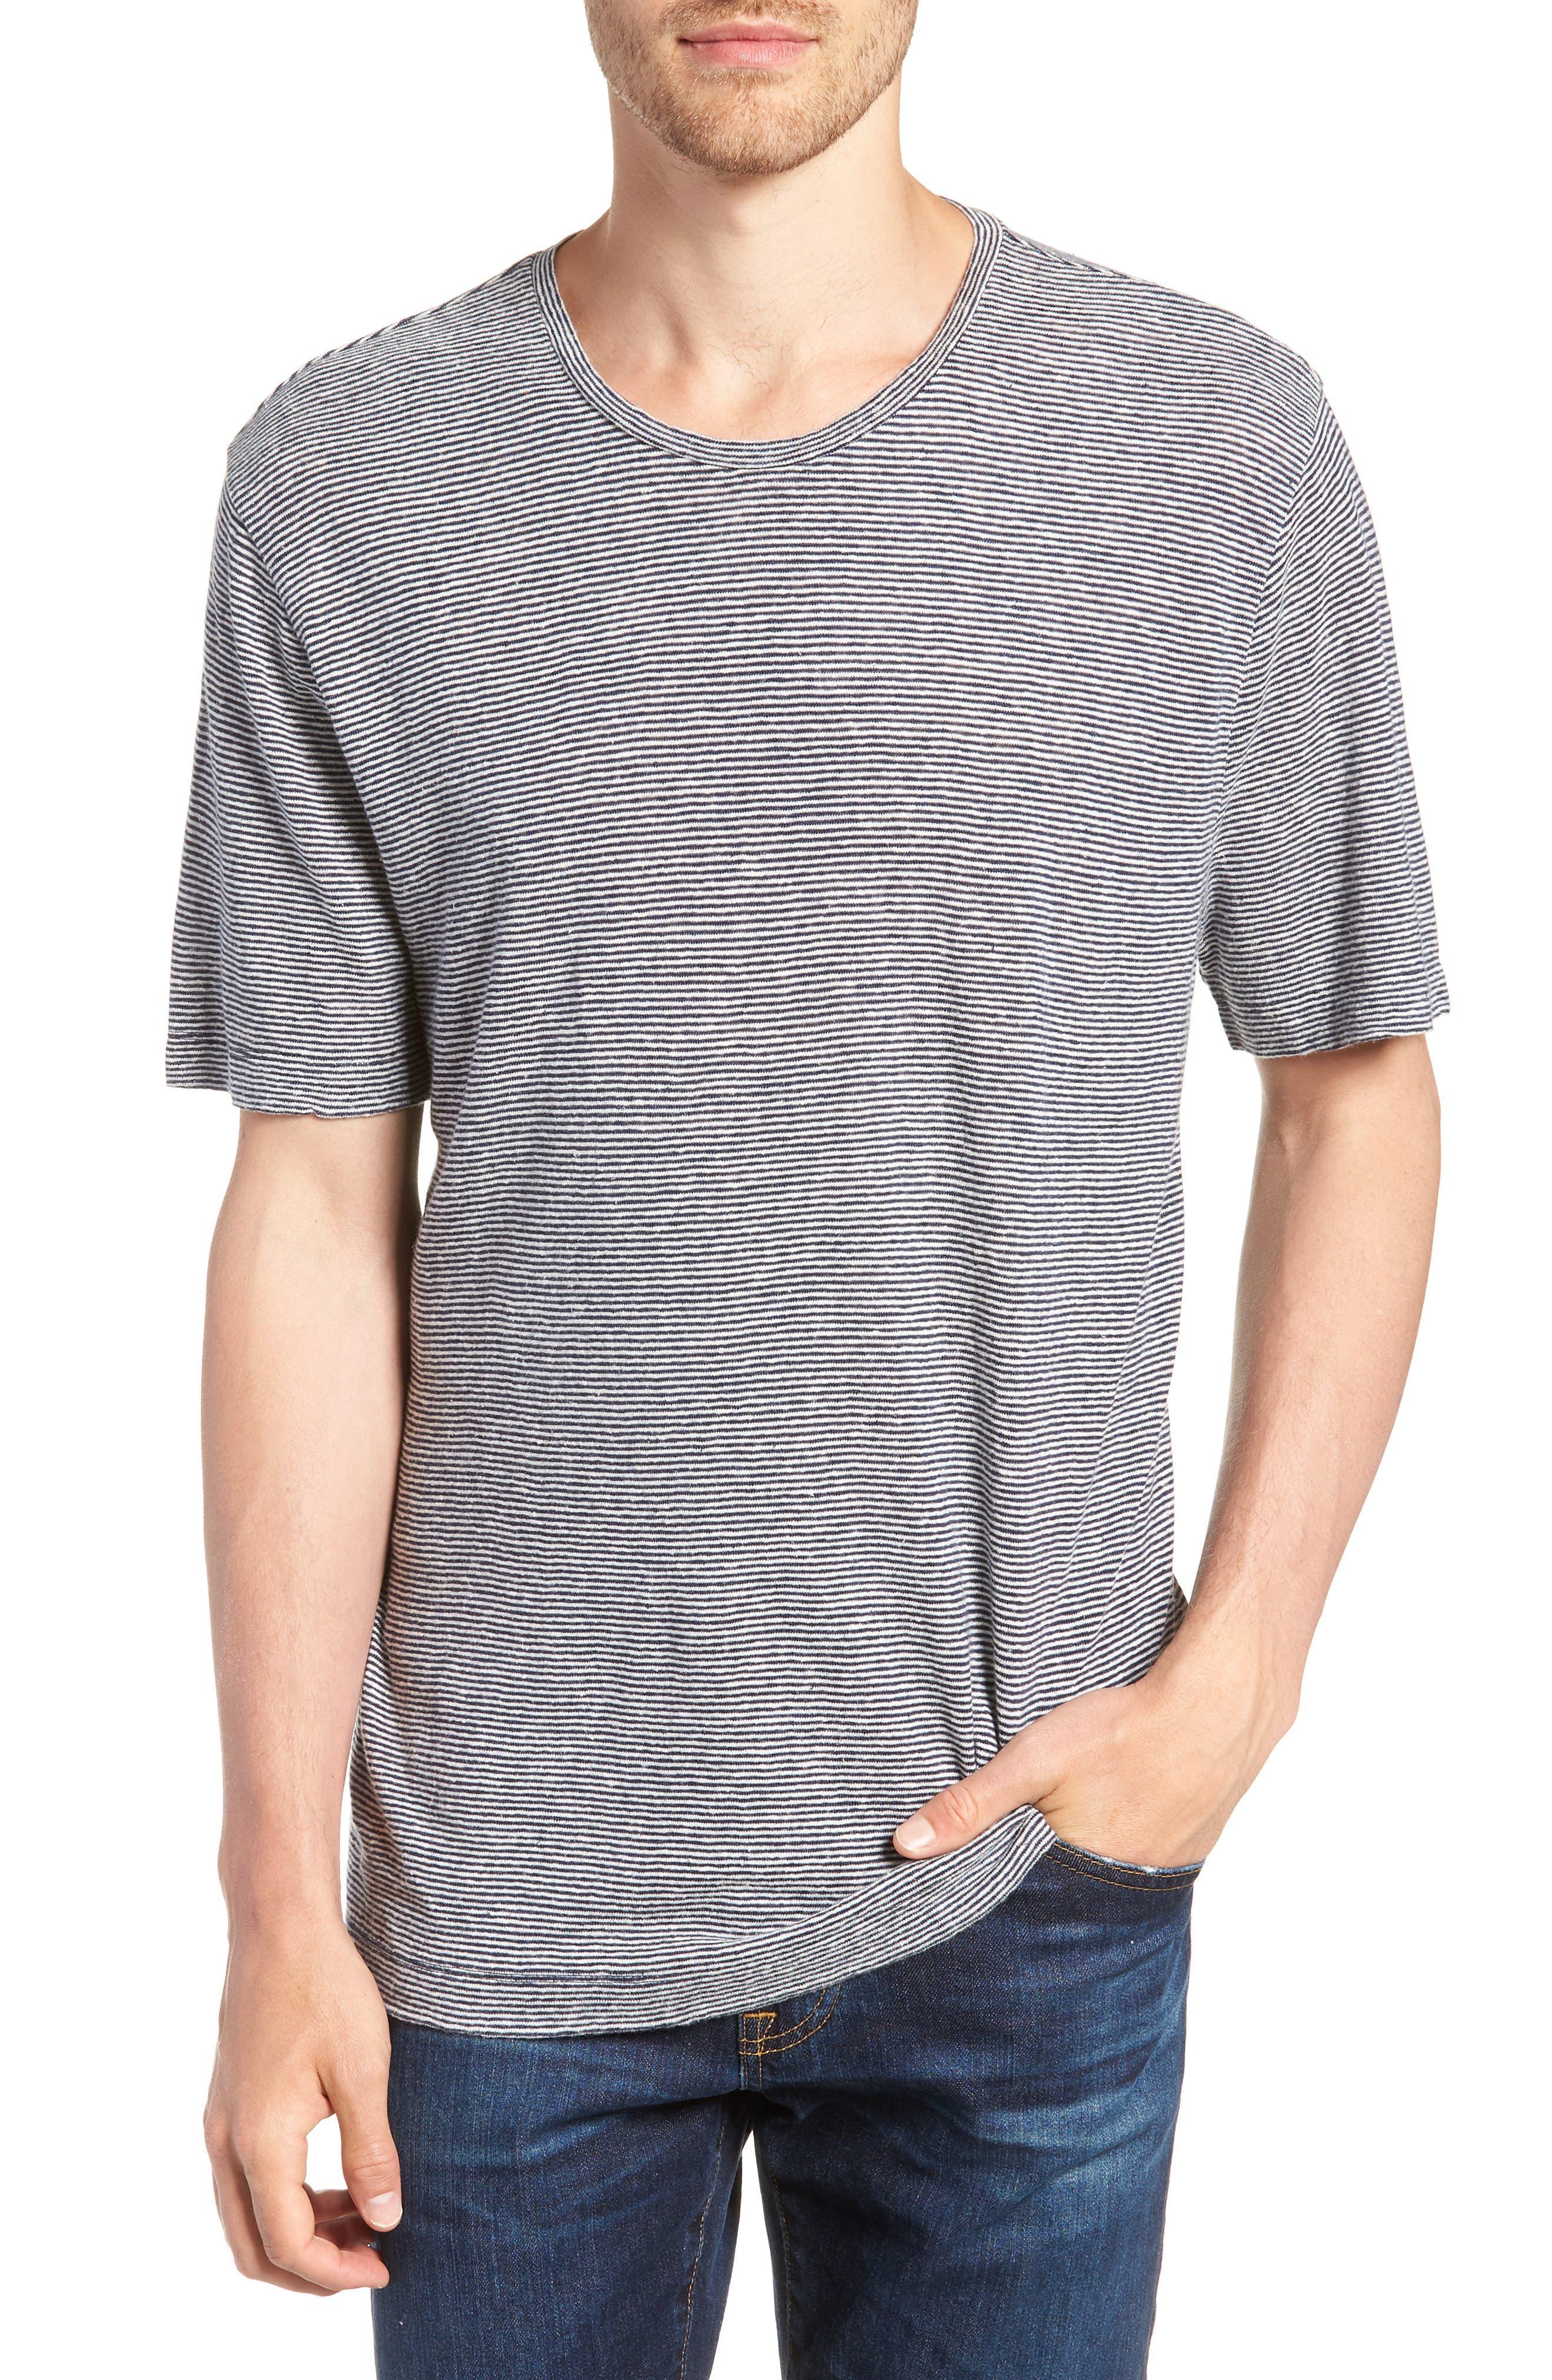 Feeder Stripe Linen Blend Jersey T-Shirt,                             Main thumbnail 1, color,                             Navy Iris White Stripe